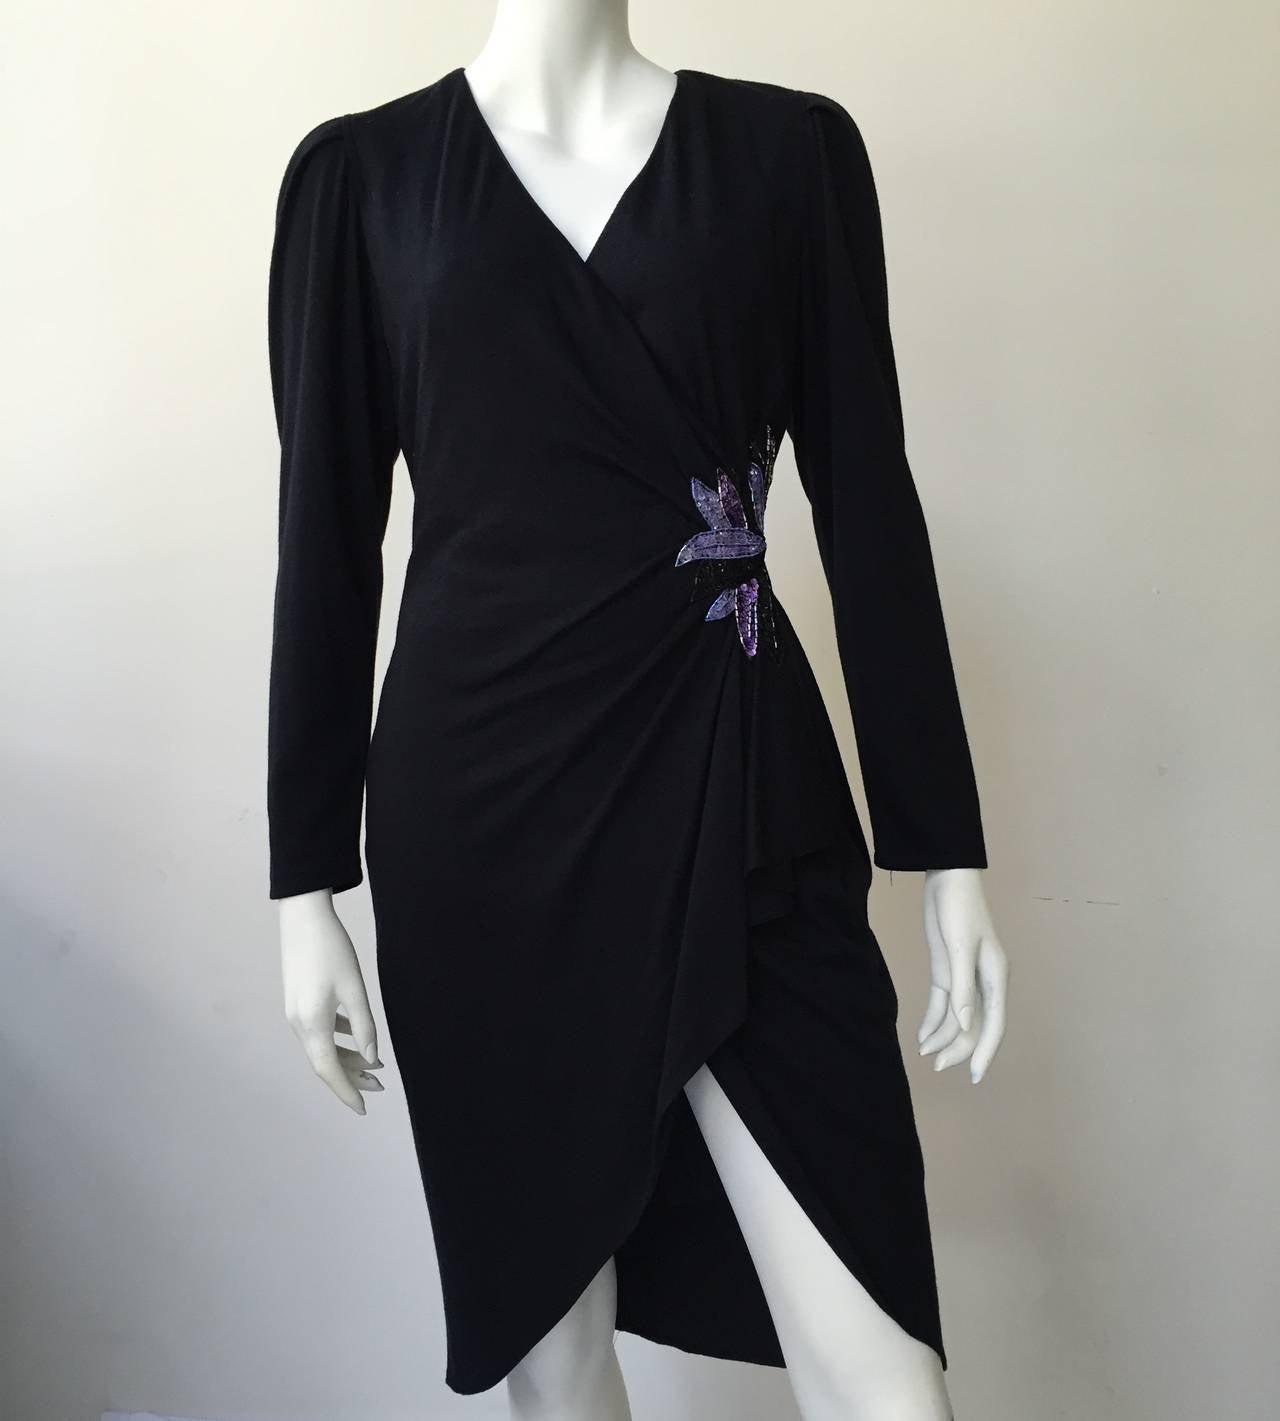 Zandra Rhodes 1980s Black with Sequin Dress Size 6. 2